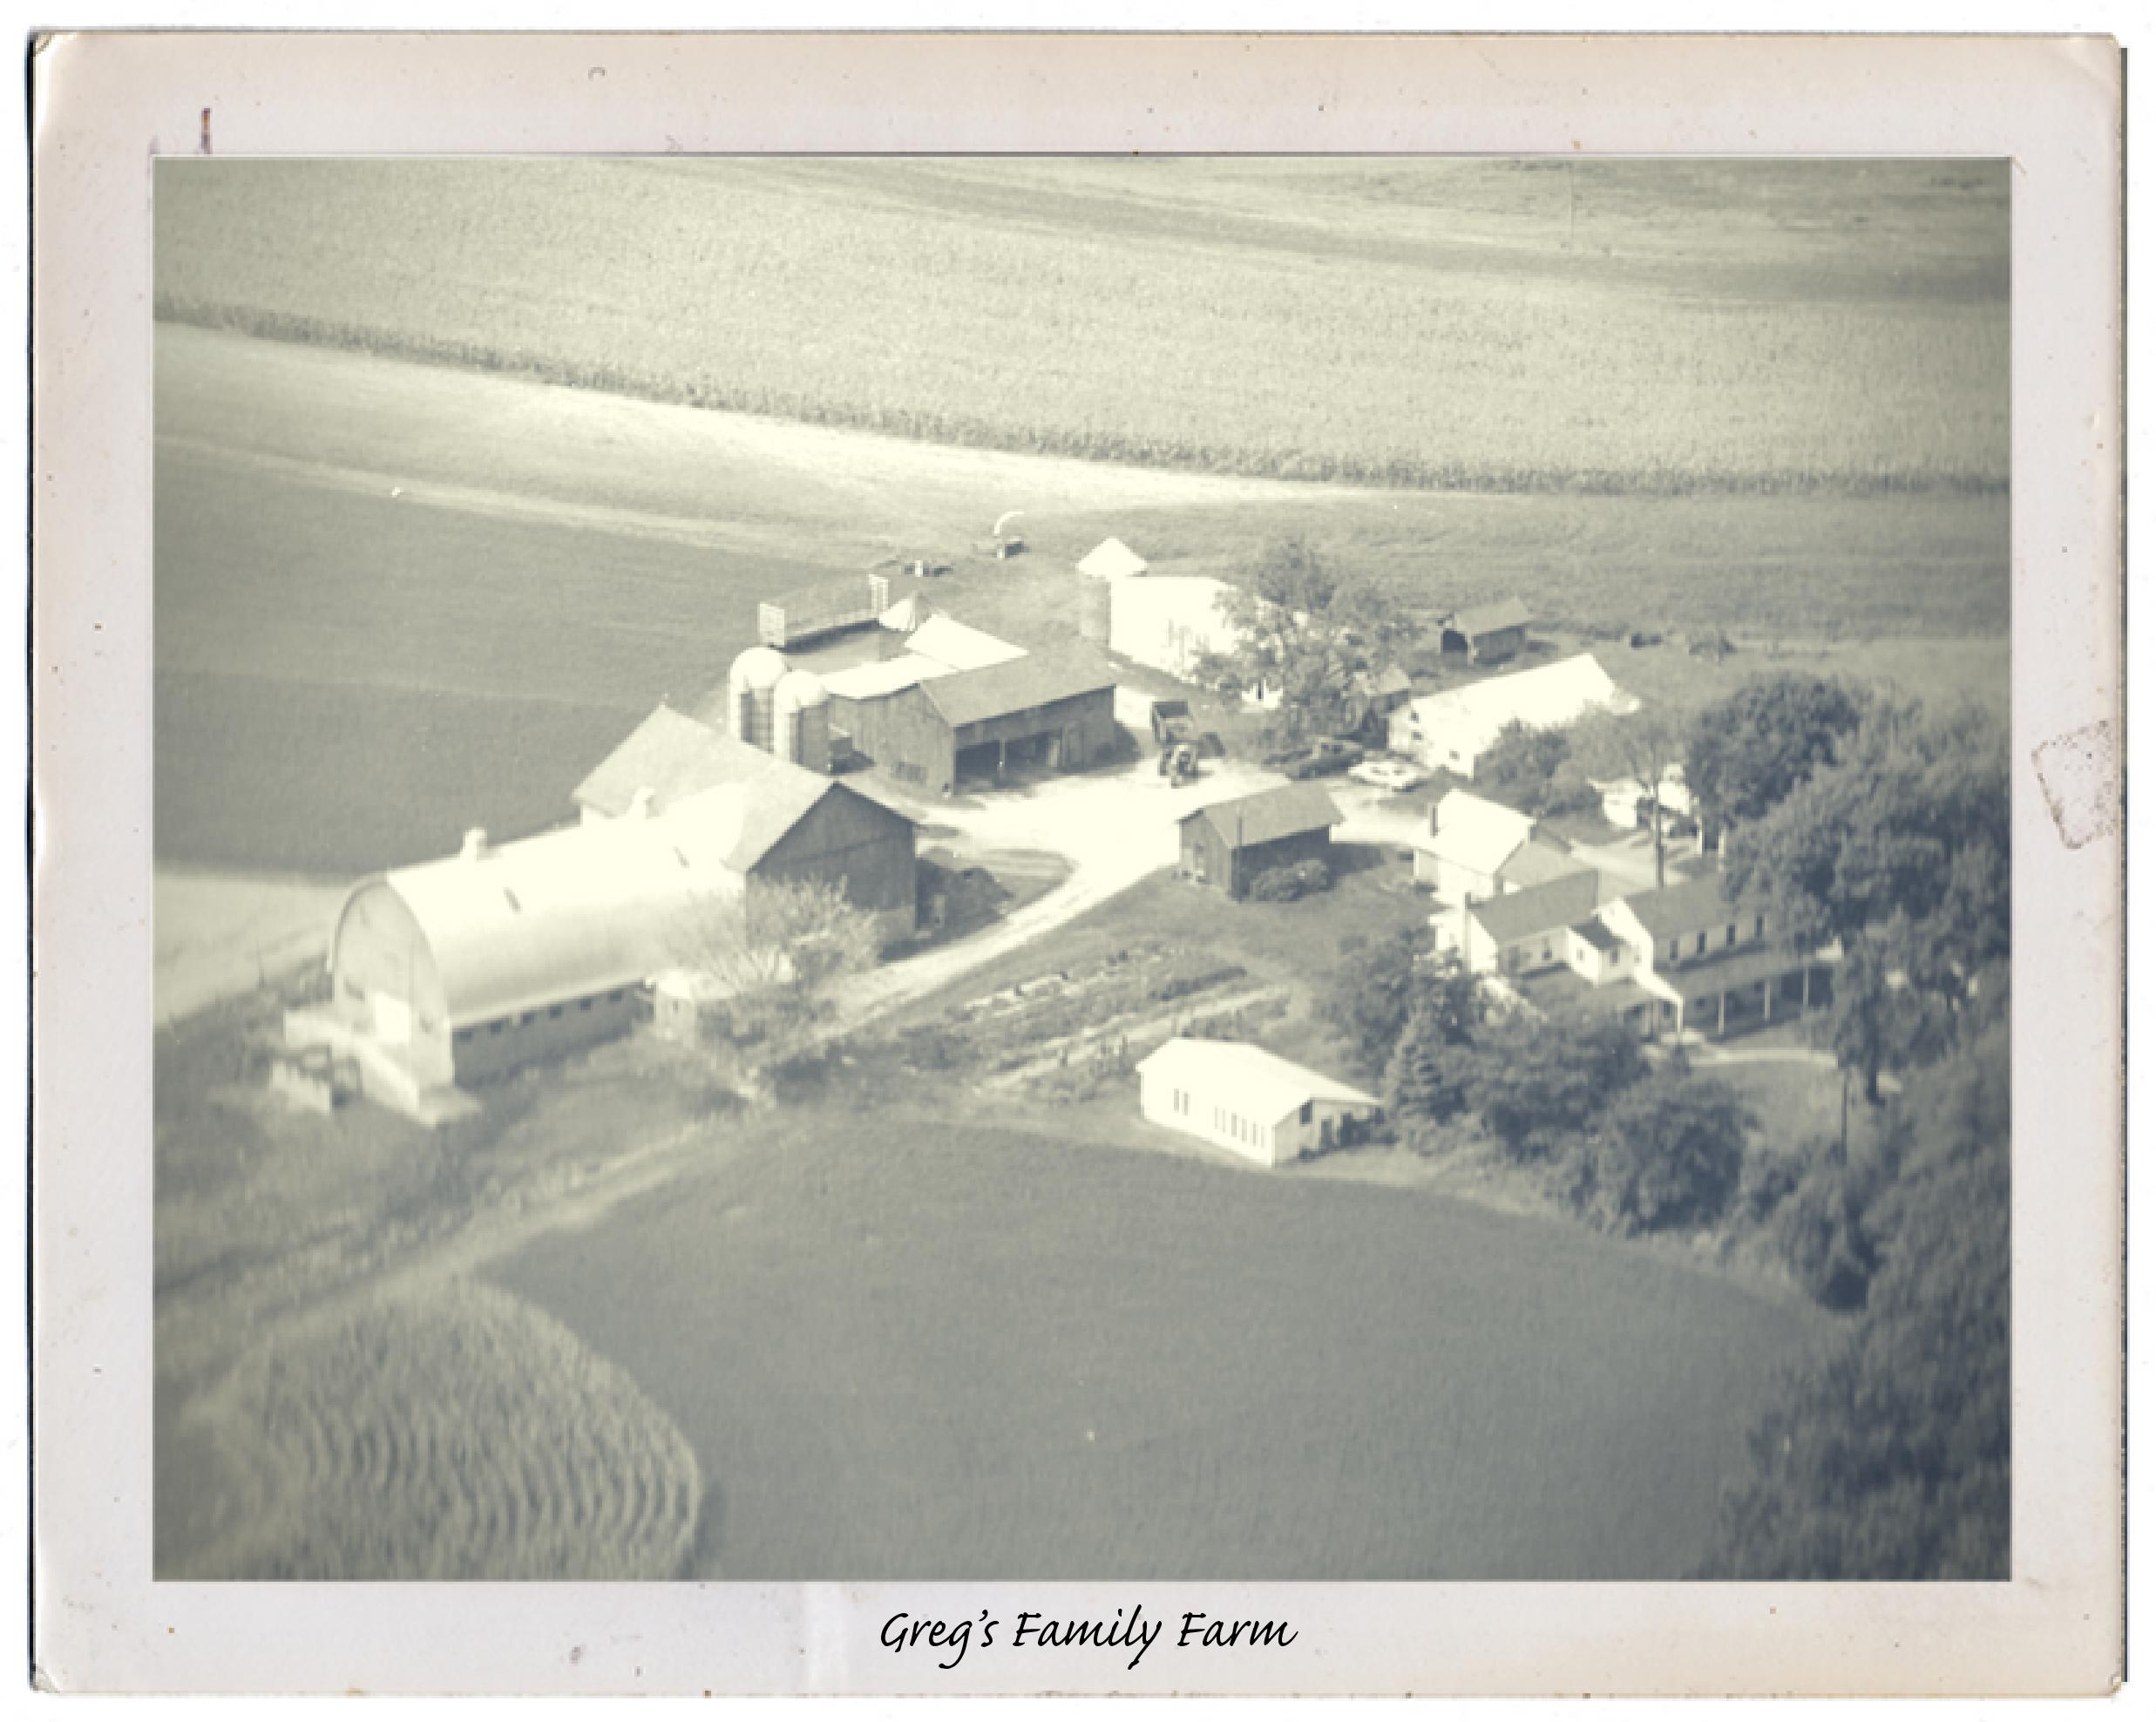 greg-stewart-family-farm.png